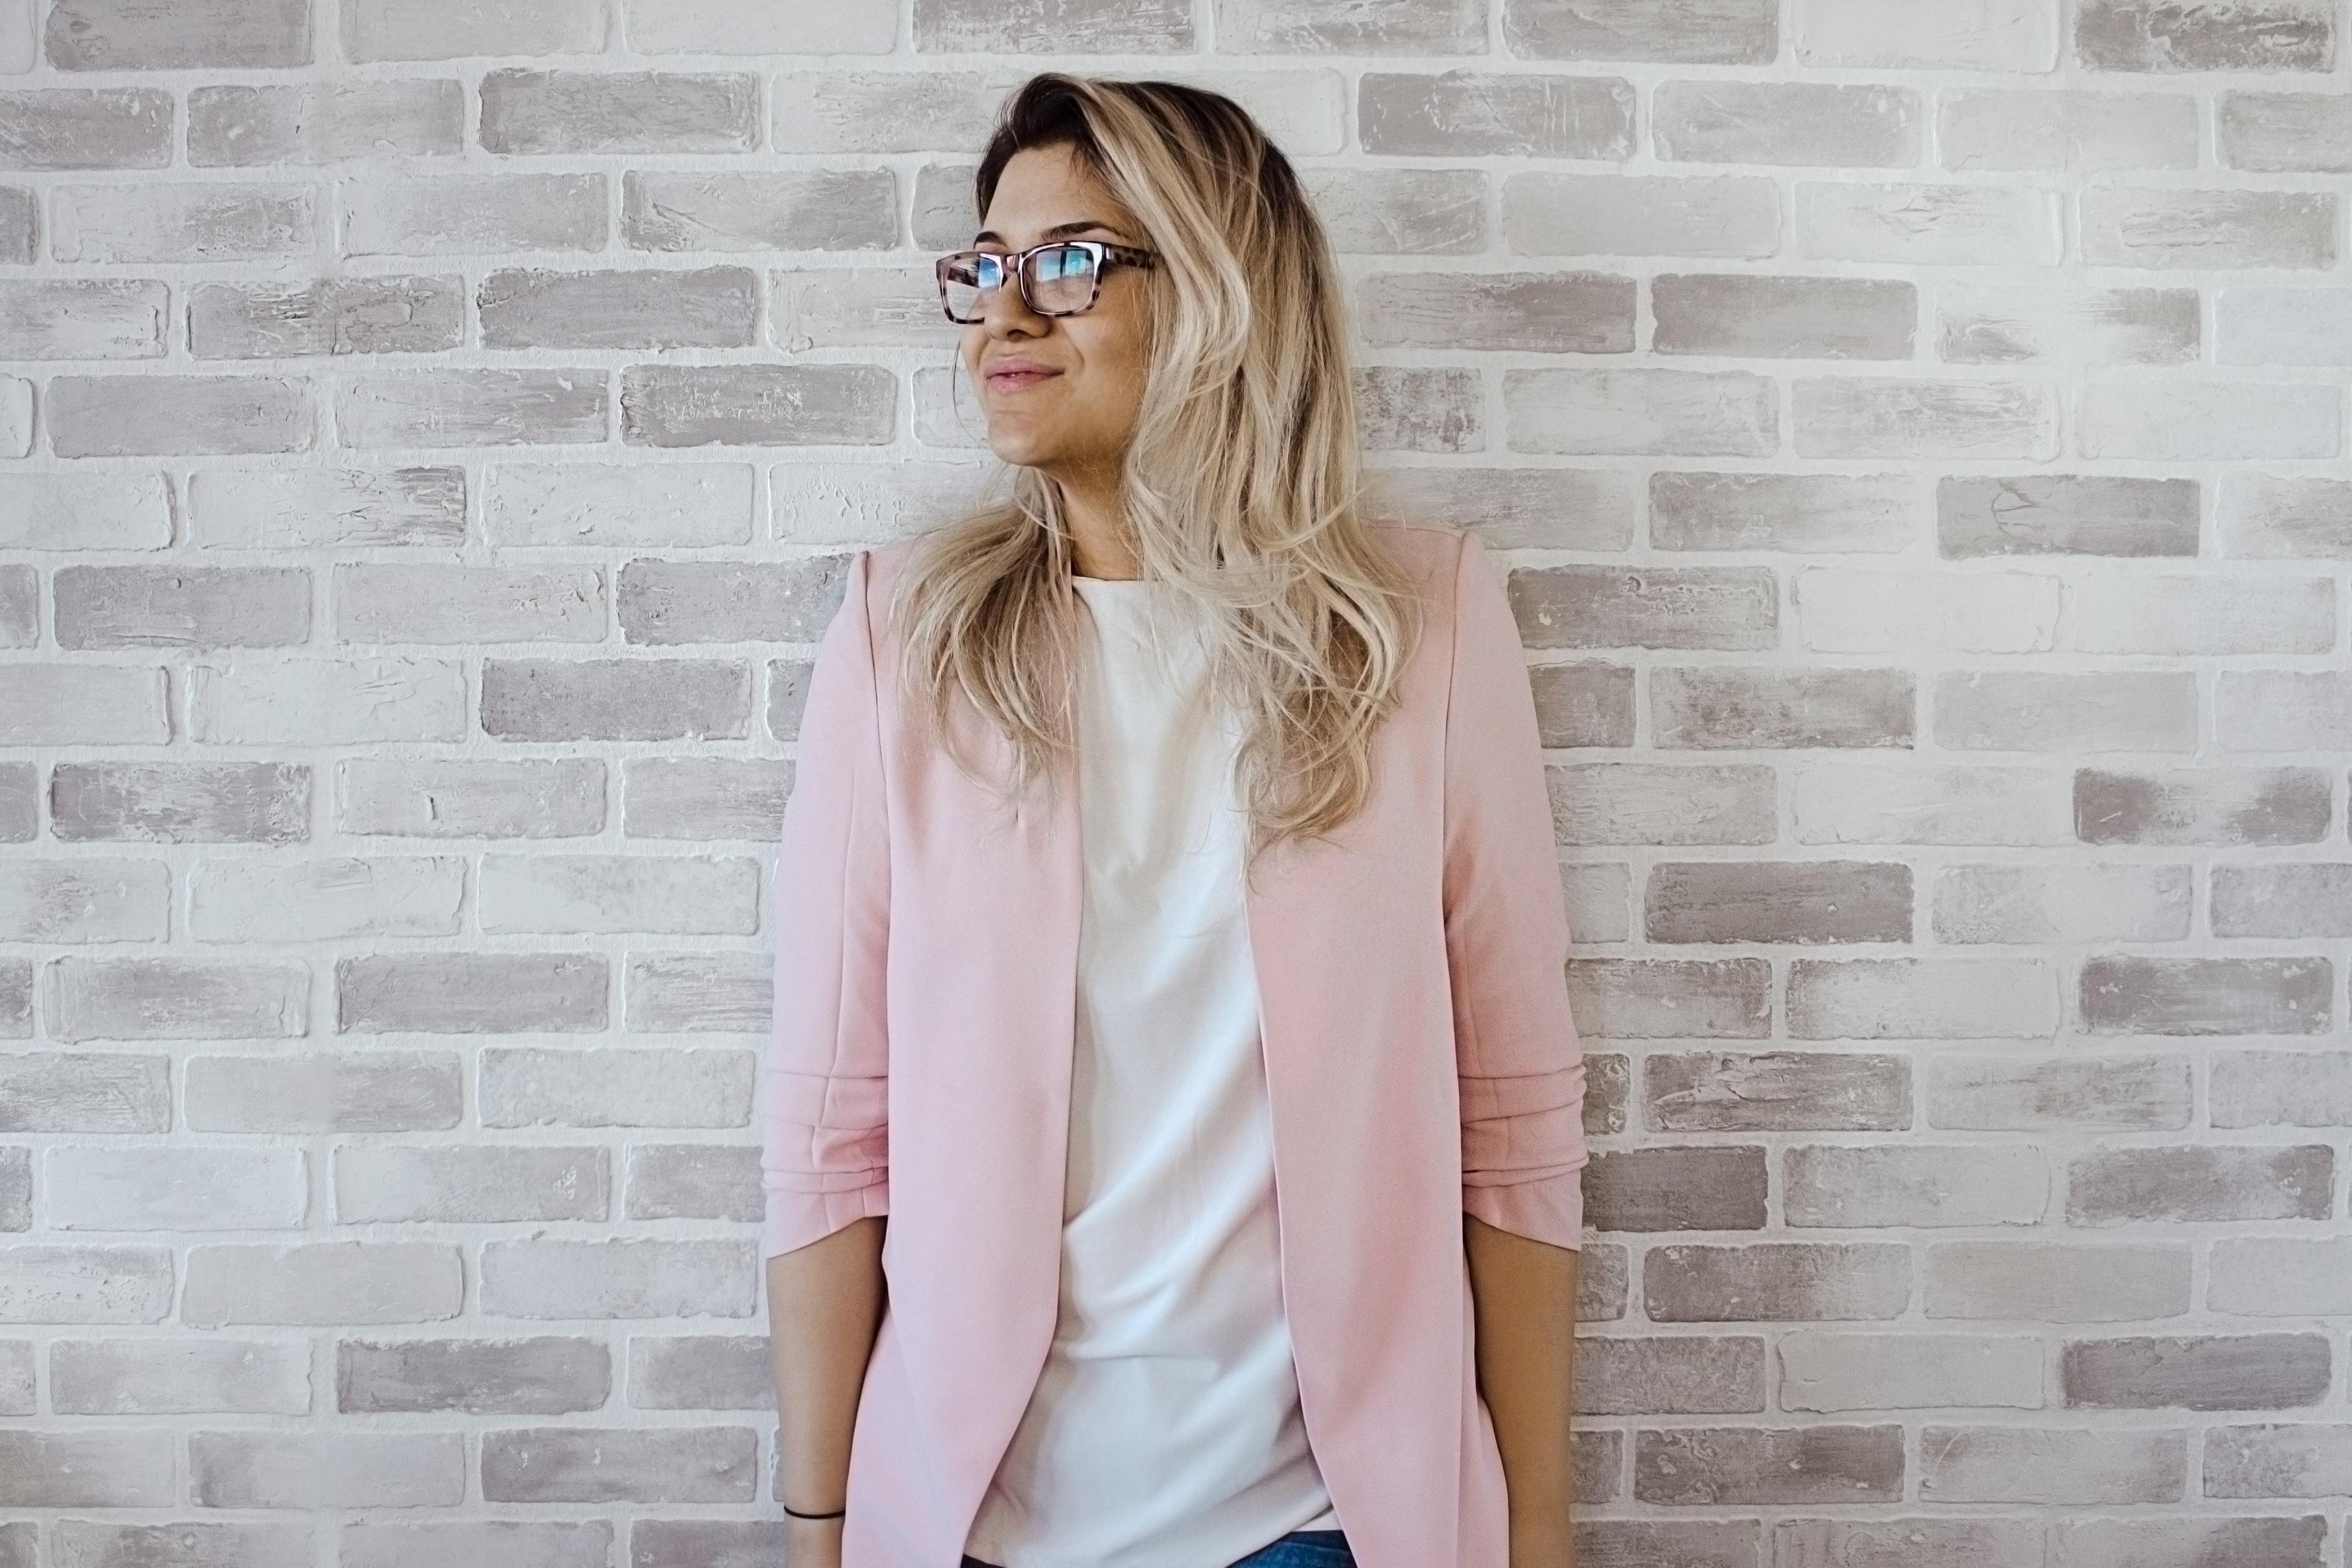 cbb3ffb76e0 6 Tips to Building a Professional Wardrobe